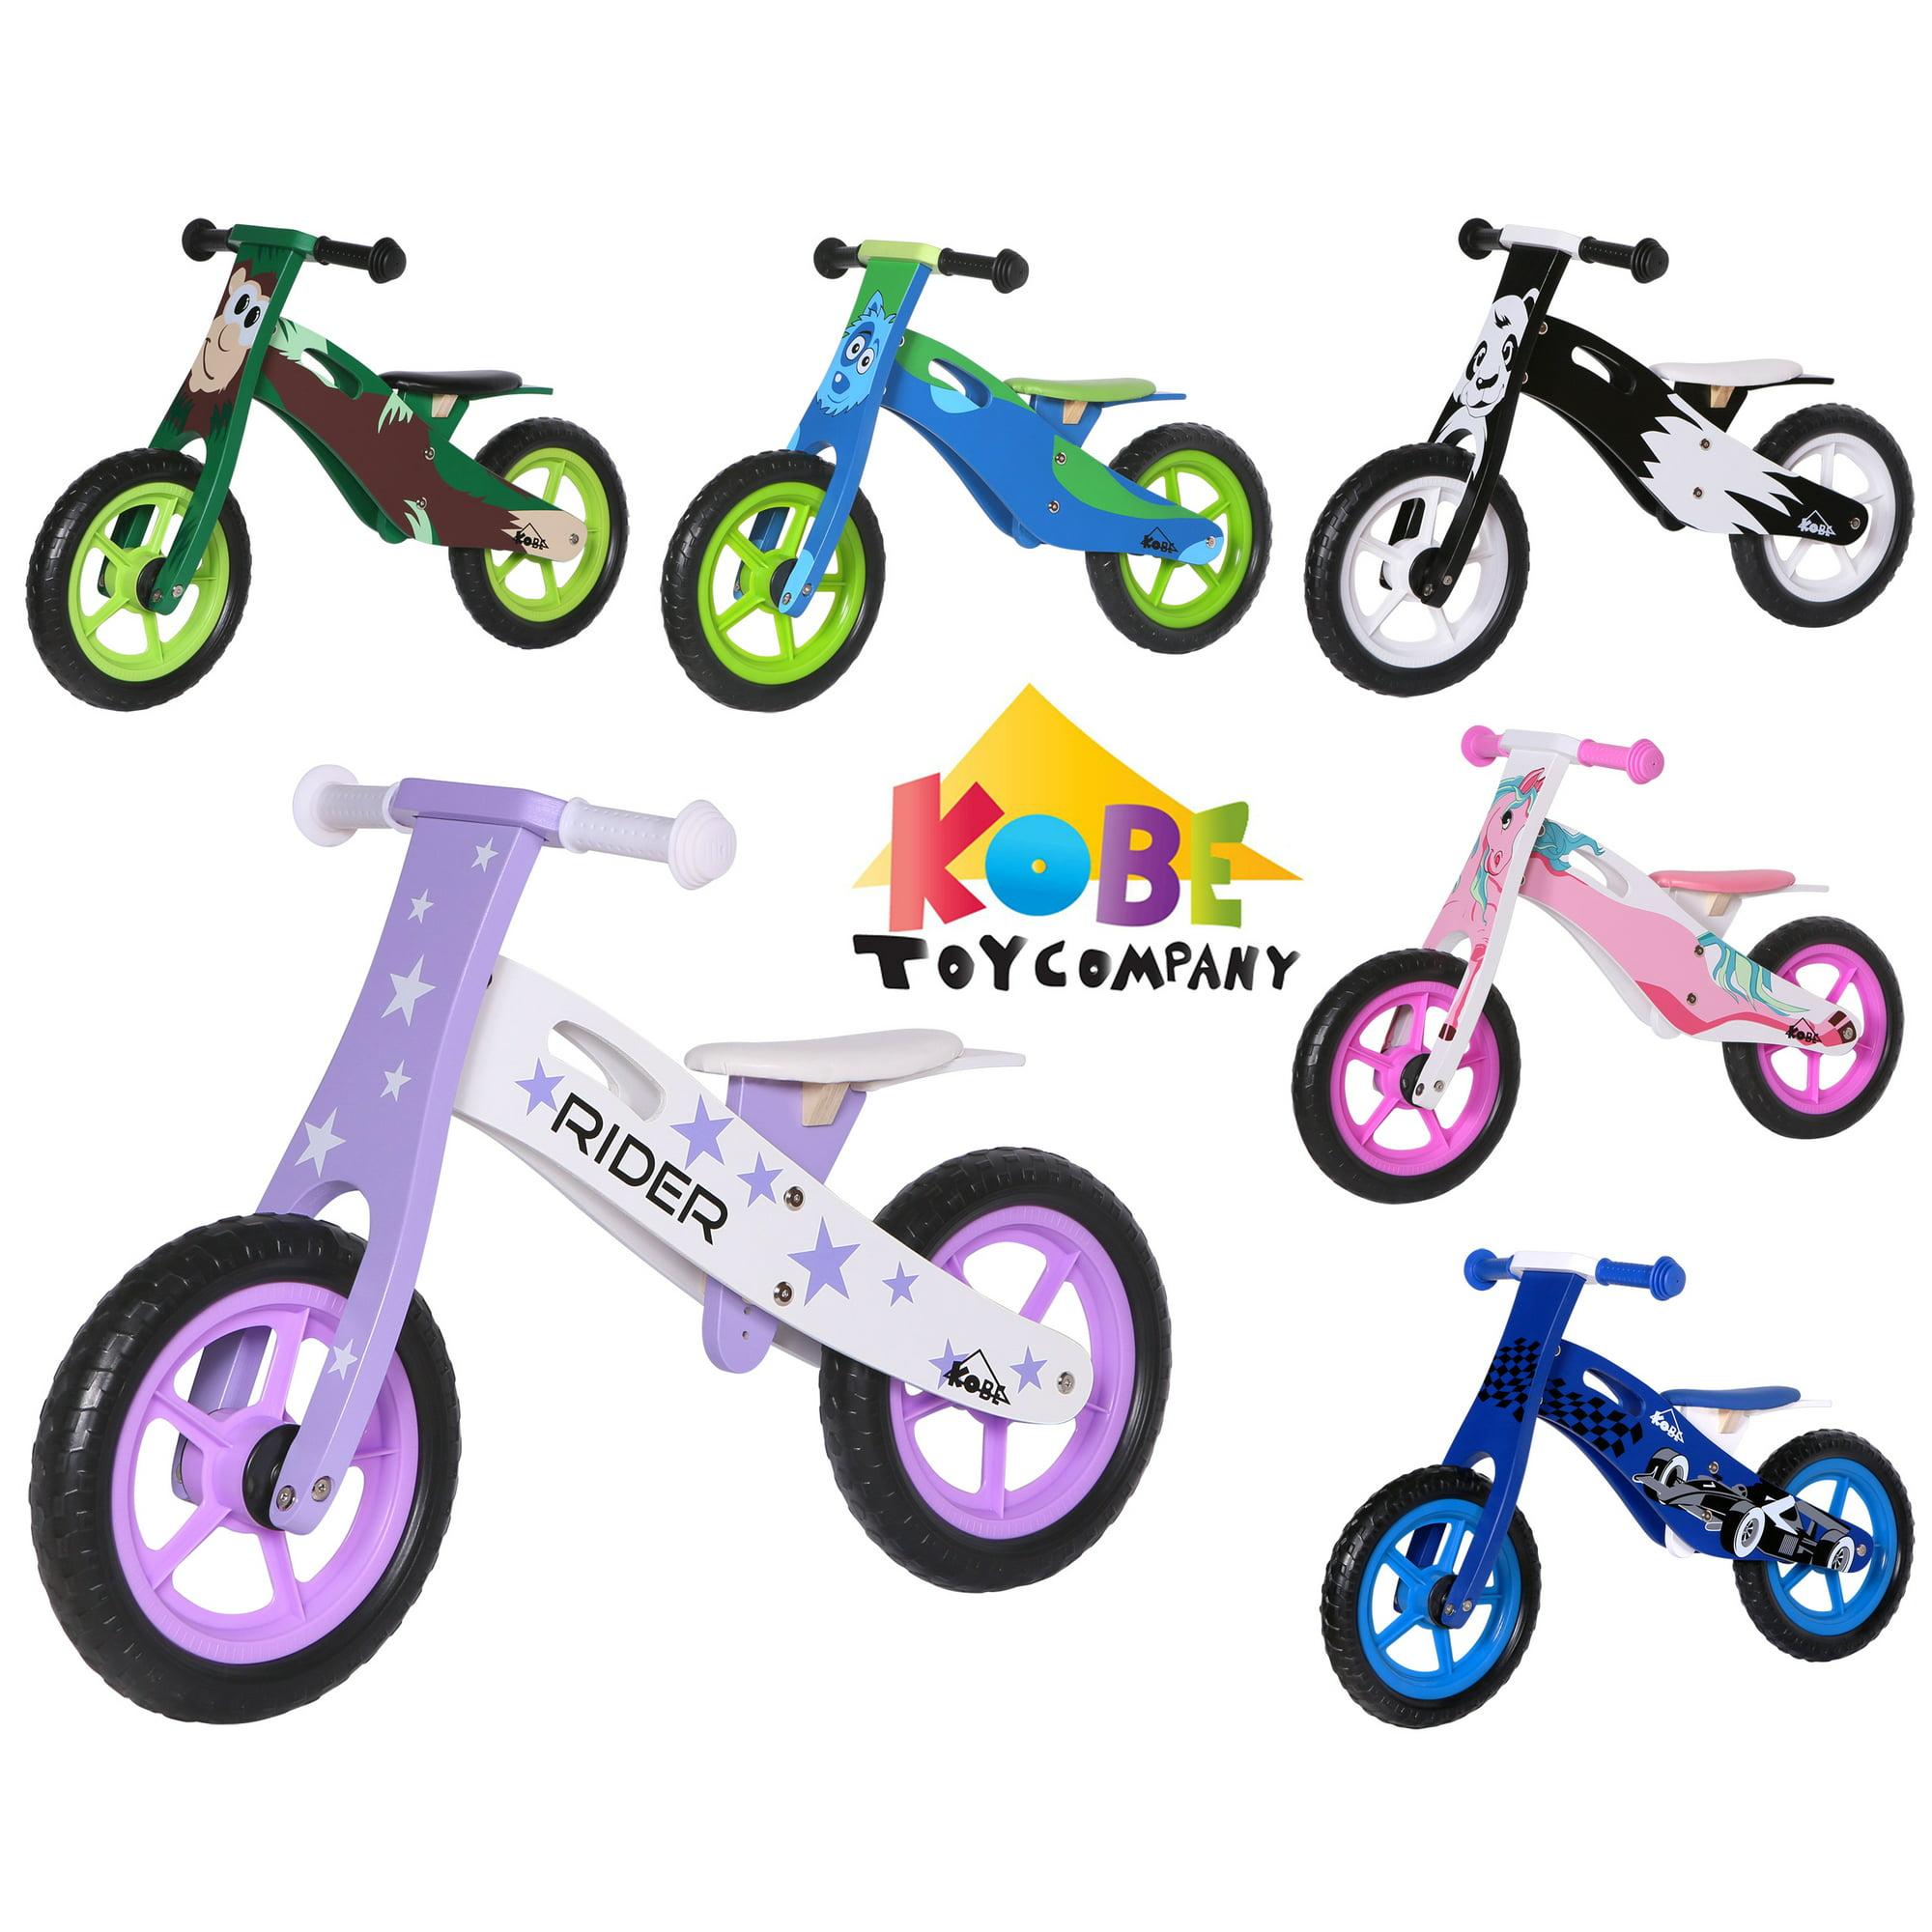 Kobe Wooden Balance Running Bike Birch Wood No Pedals Perfect Training Bike For Toddlers Kids Stars